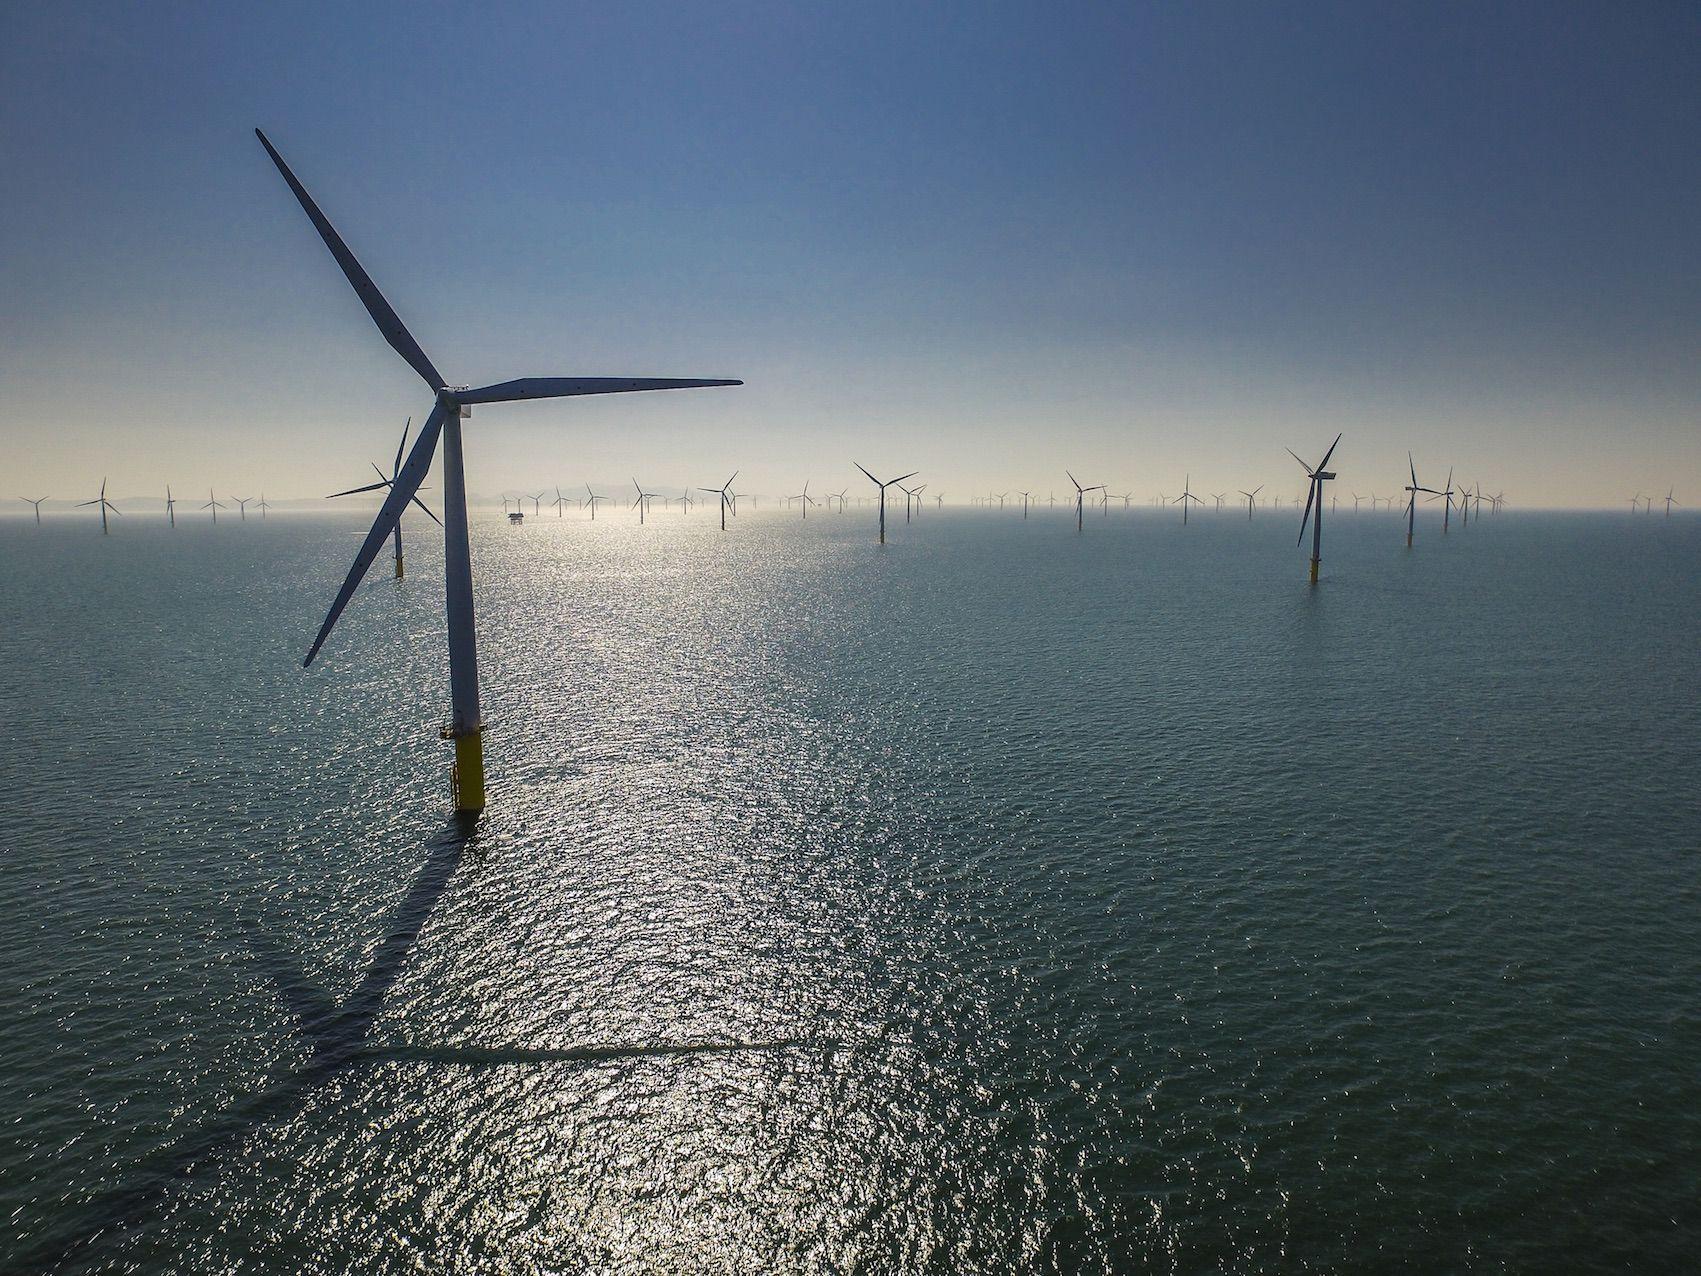 Innogy_RWE_Offshore_Wind_XL_1701_1276_80_c1